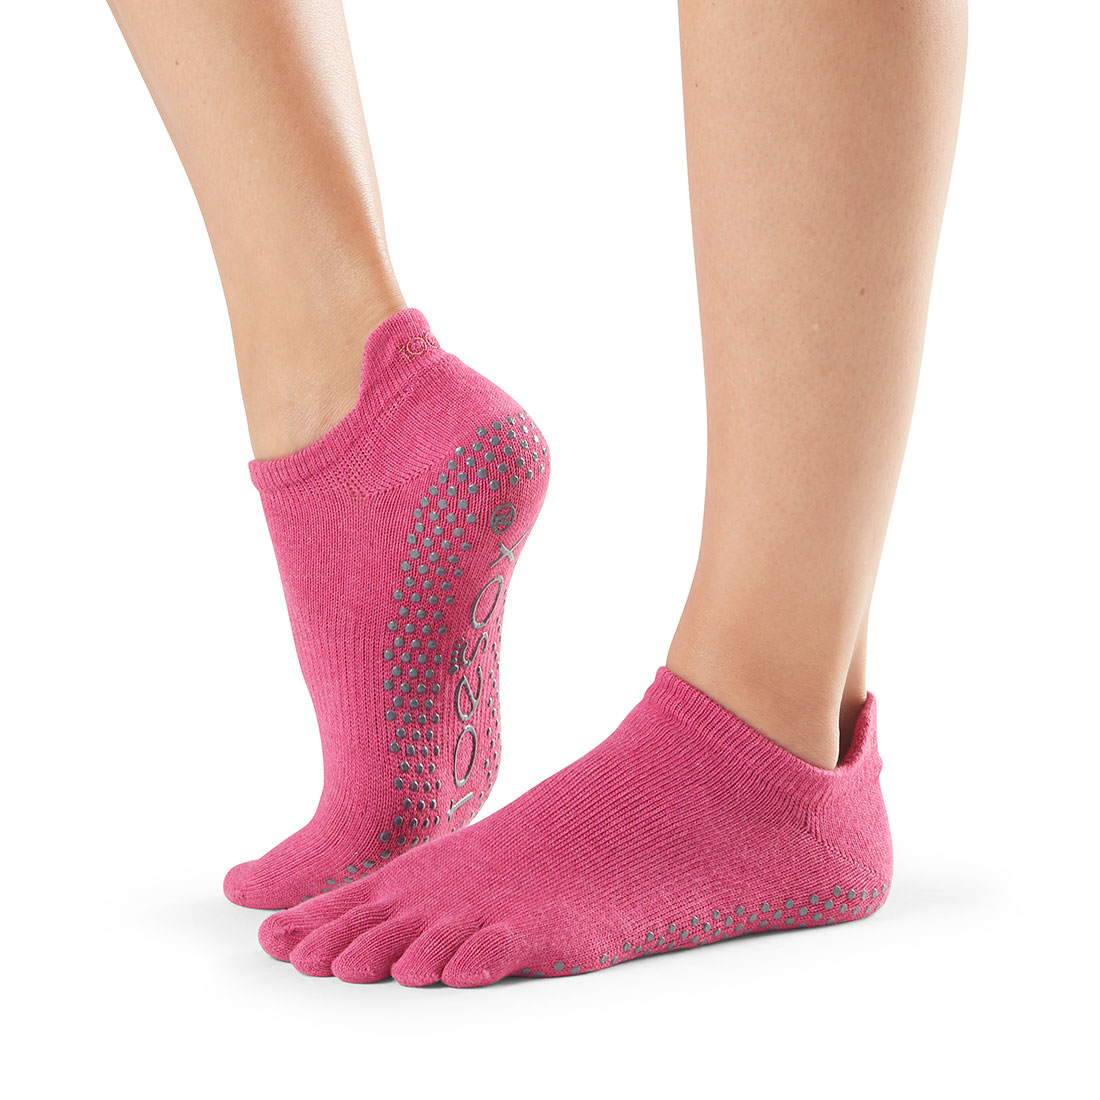 Yogasocken ToeSox Low Rise Full Toe Raspberry - 1